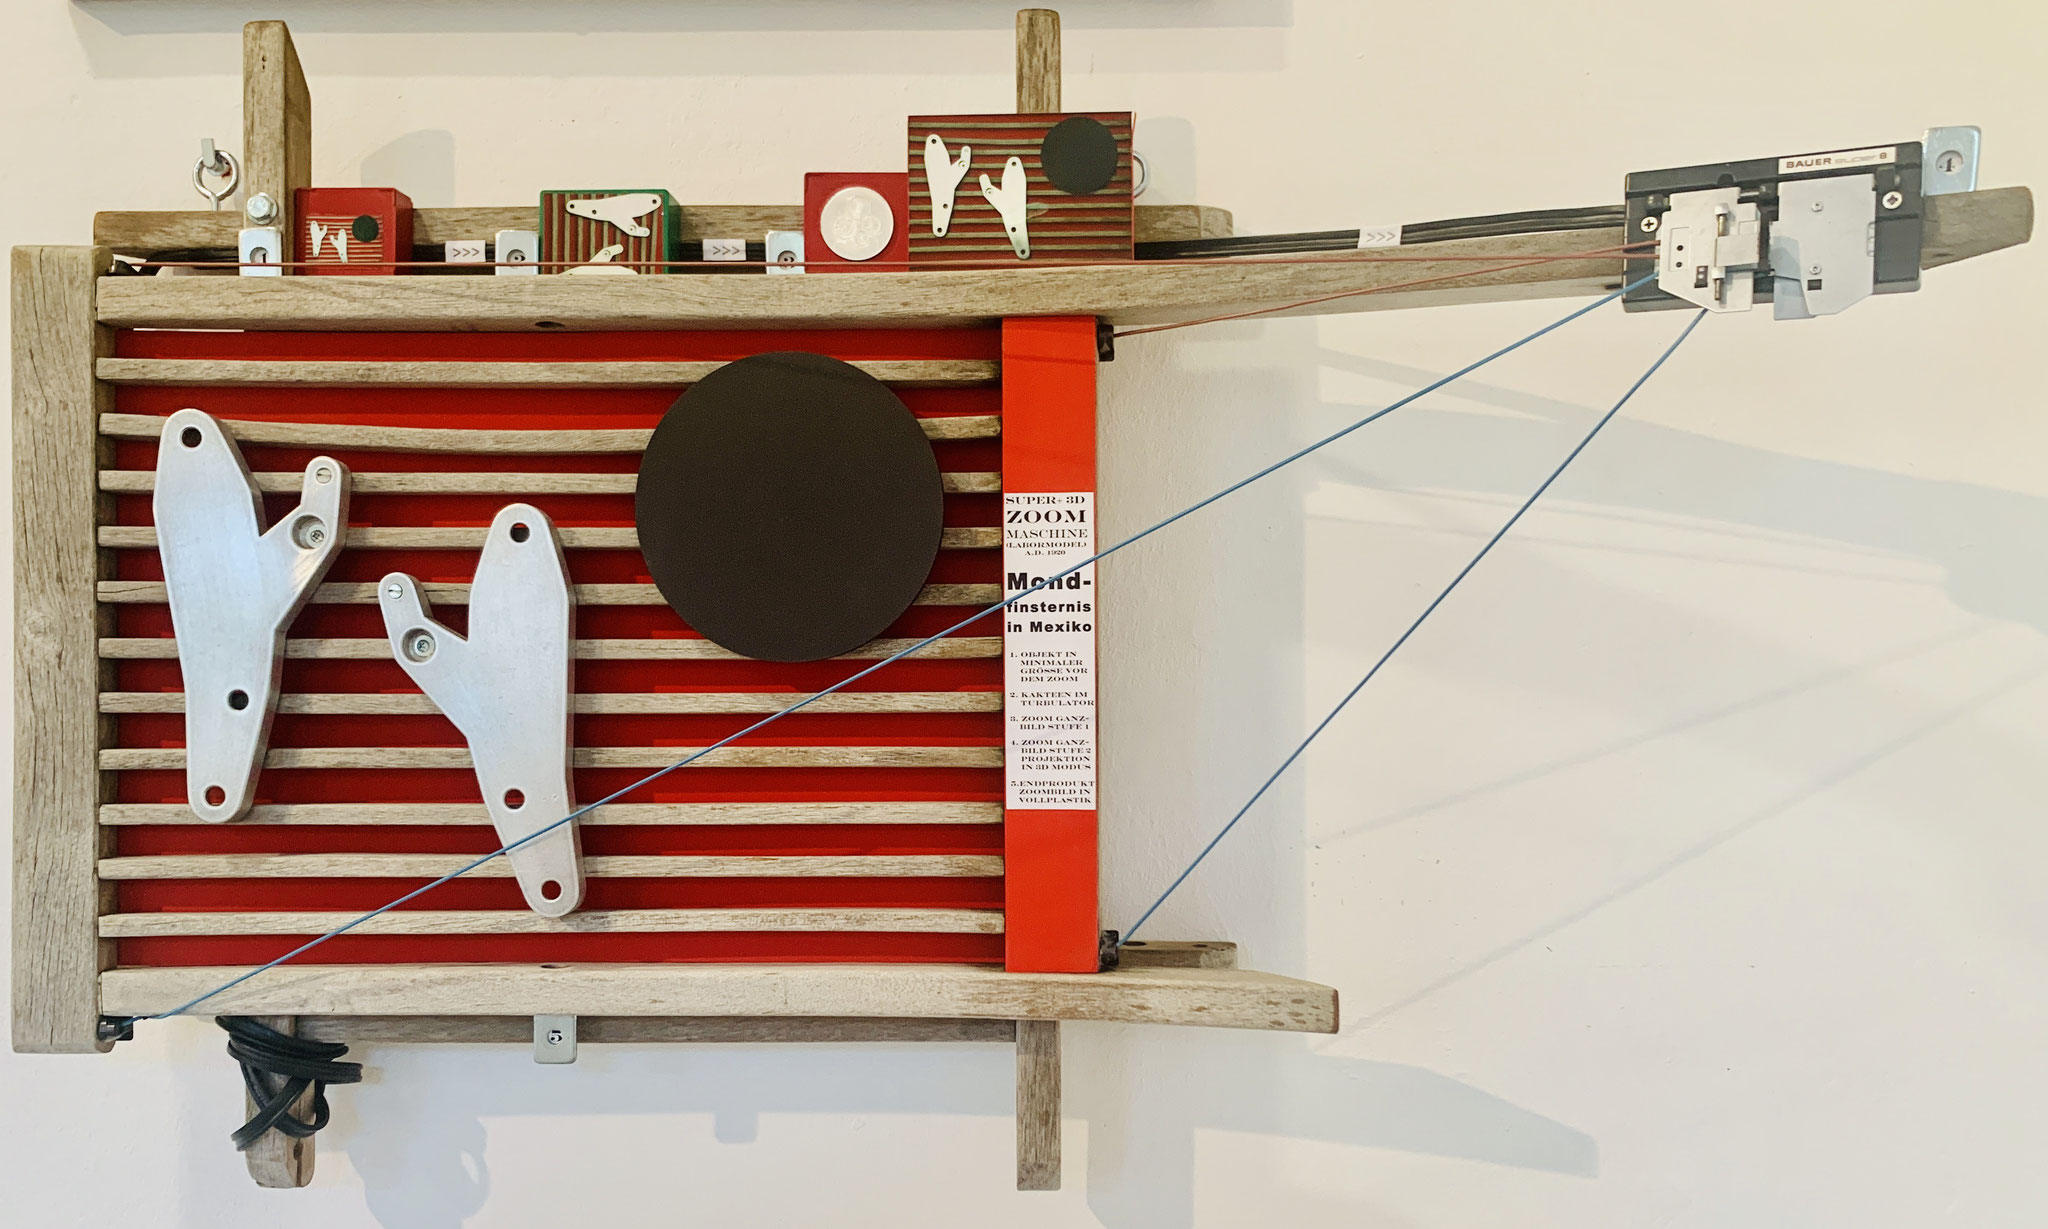 57. Burchard Bott, Mondfinsternis in Mexiko, Holz-Metall-Collage, 600 x 440 mm, 2020, Preis auf Anfrage